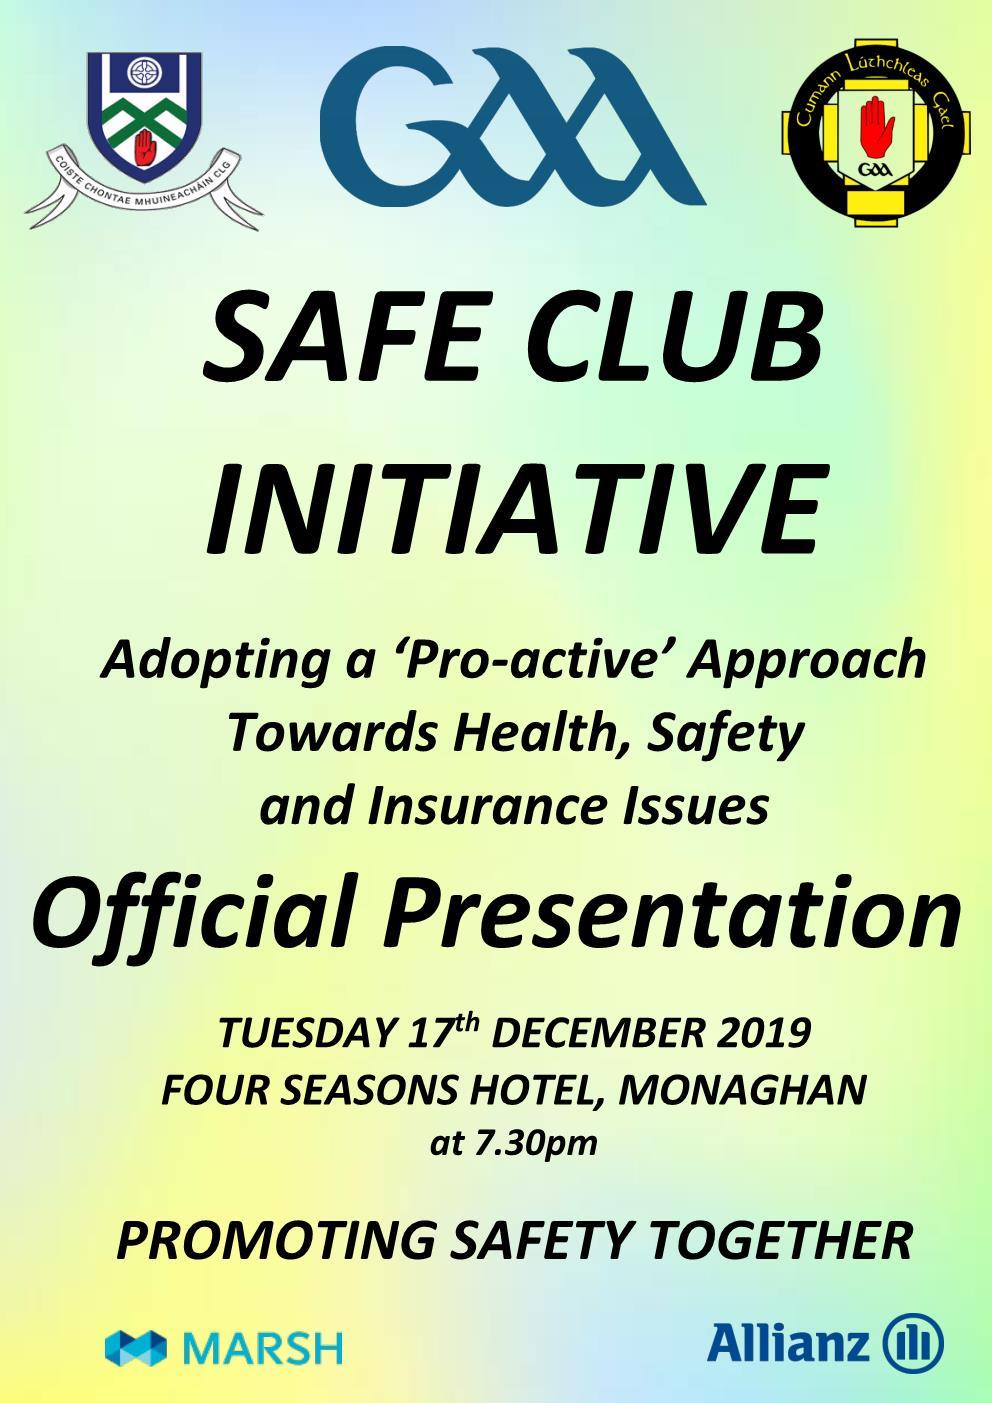 Safe Club Presentation Night – TUESDAY 17thDECEMBER